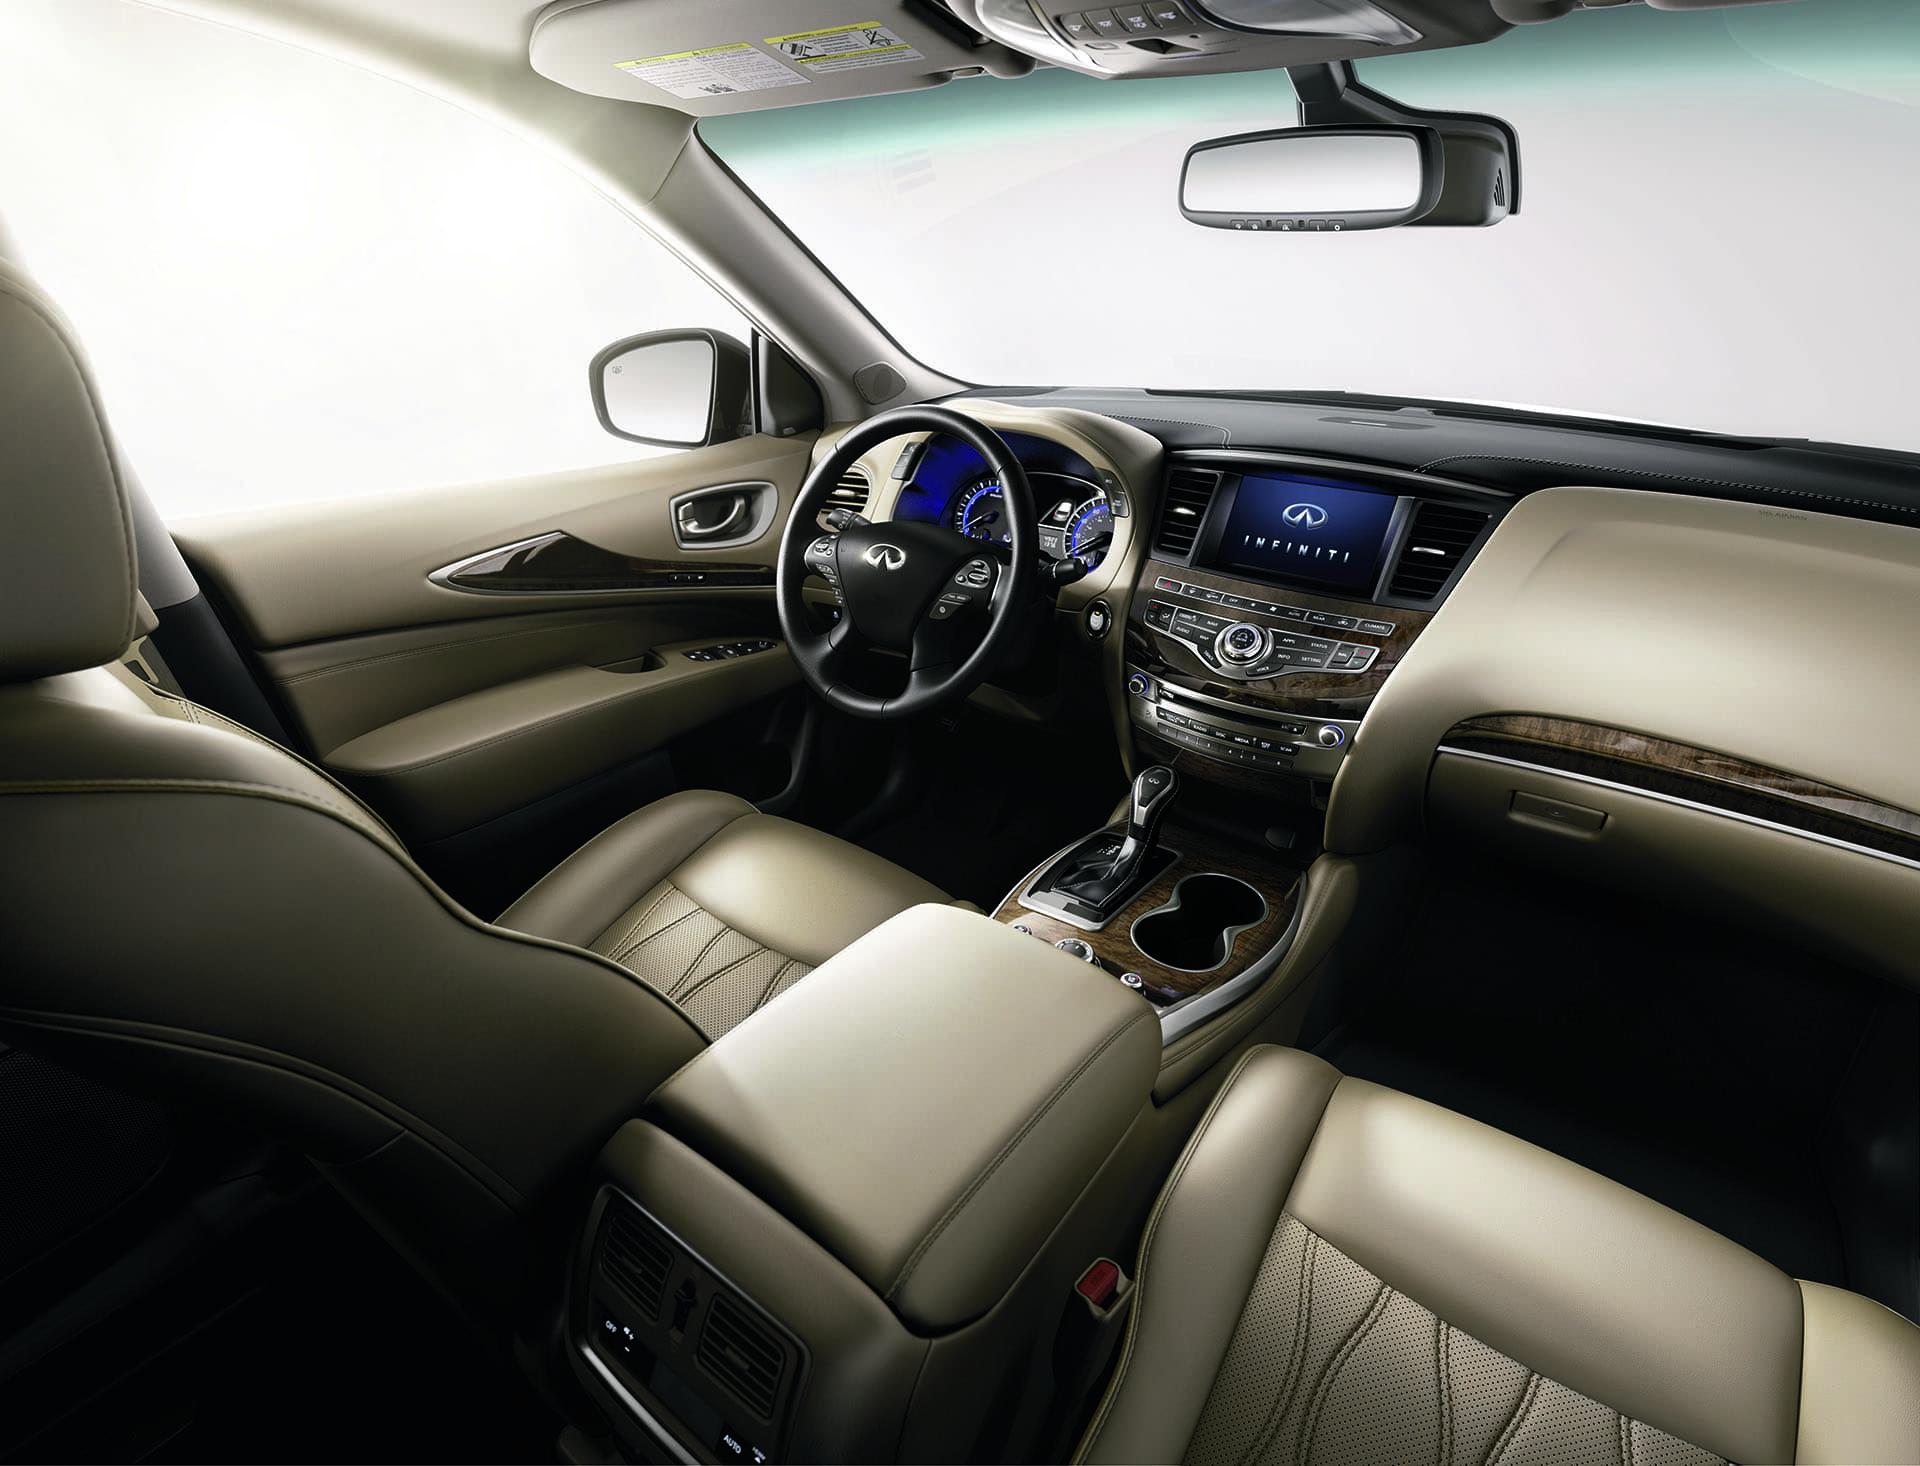 2020 INFINITI Qx60 Suv Interior View